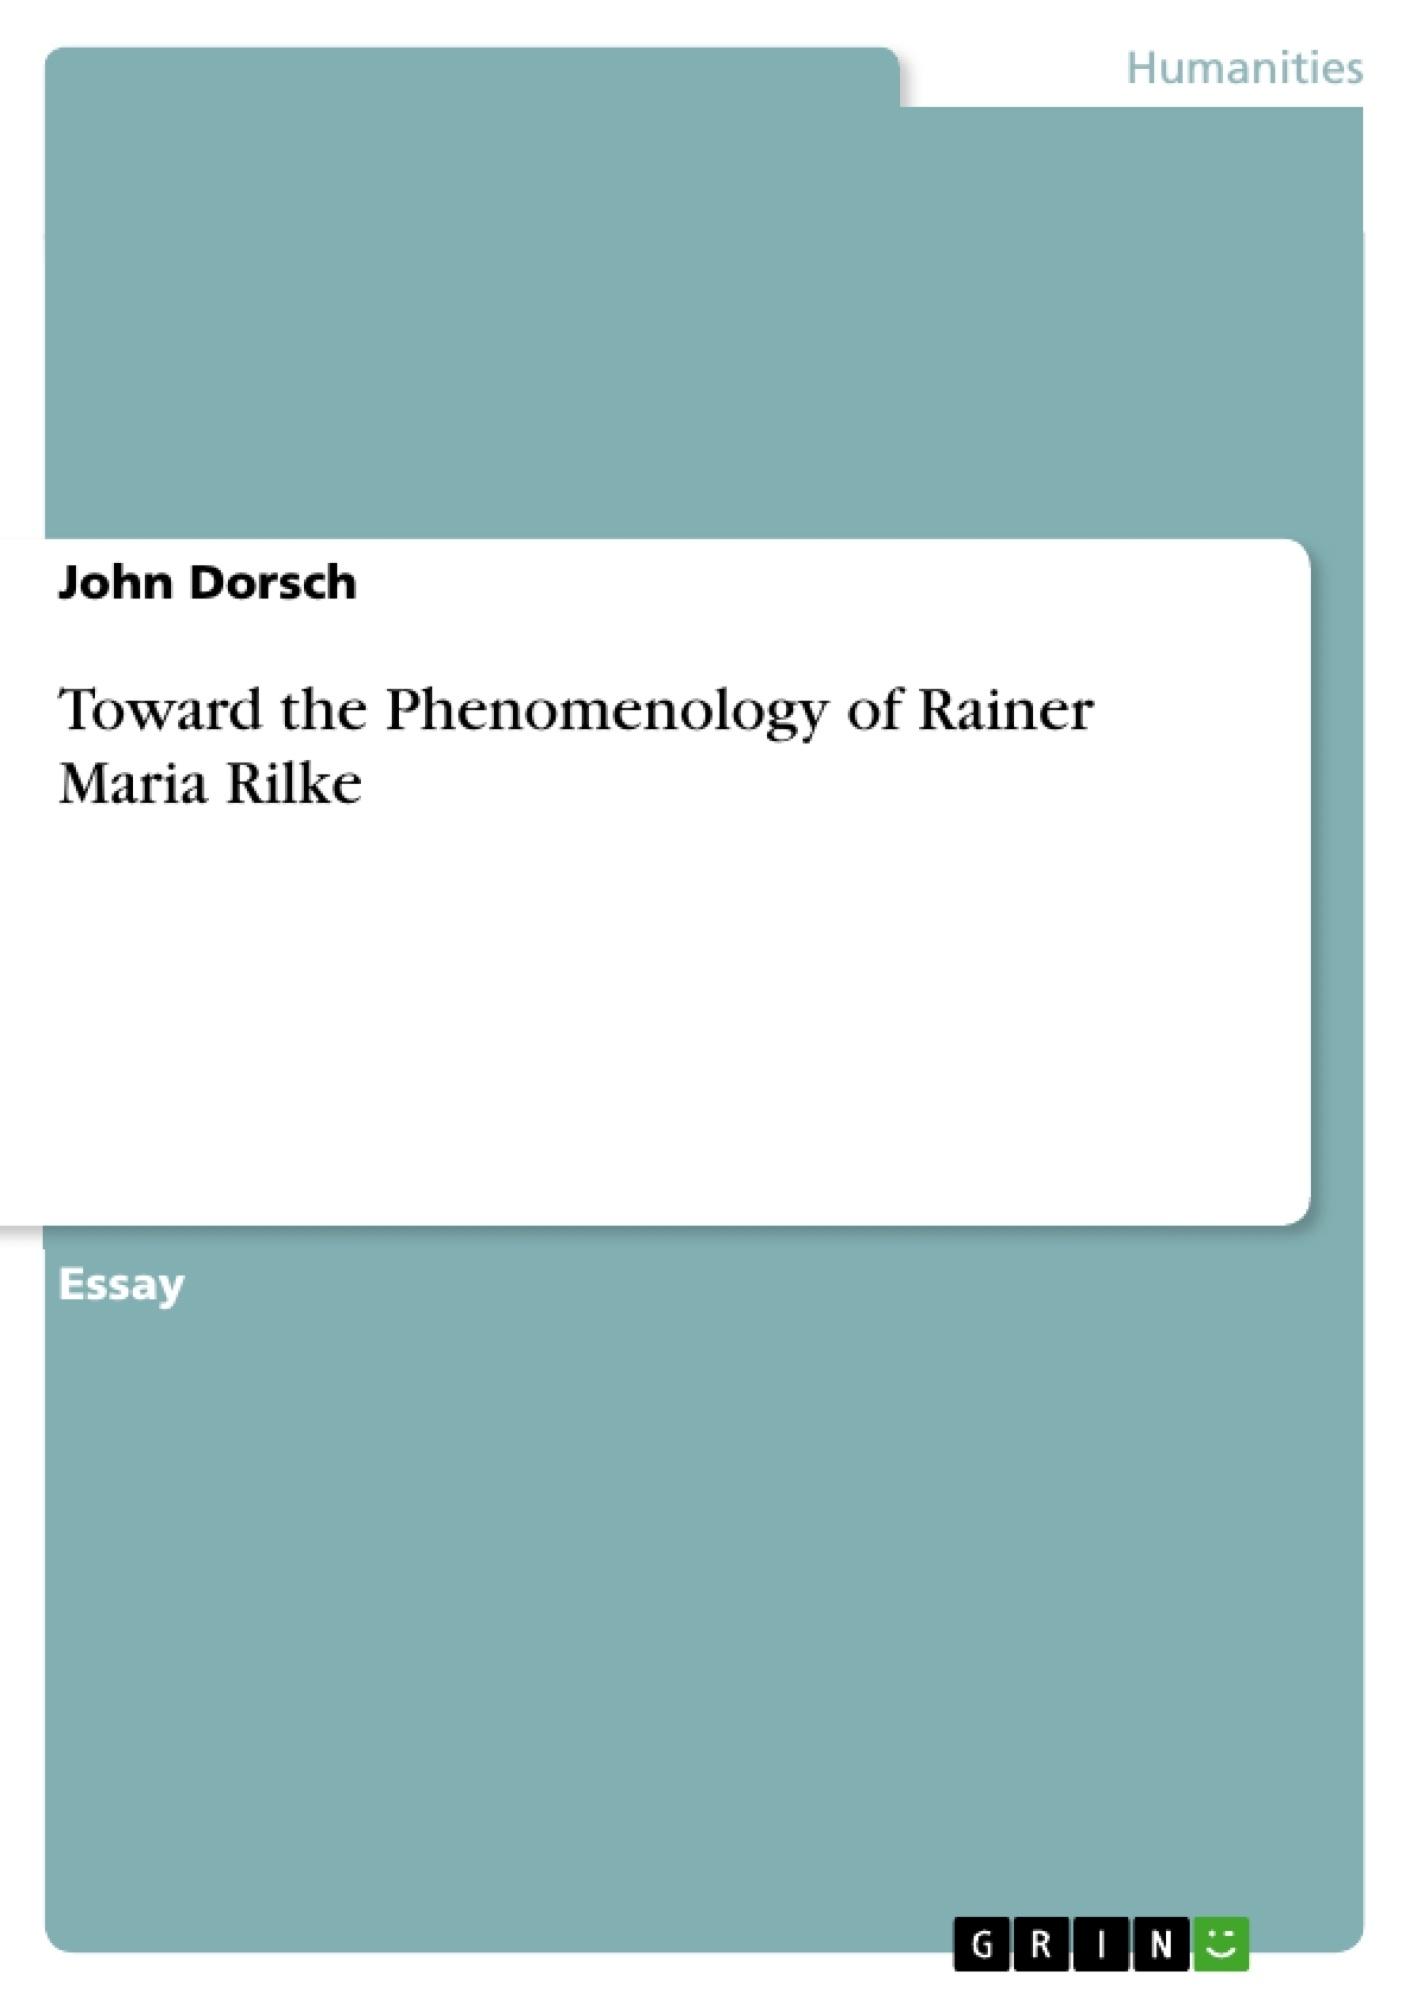 Title: Toward the Phenomenology of Rainer Maria Rilke